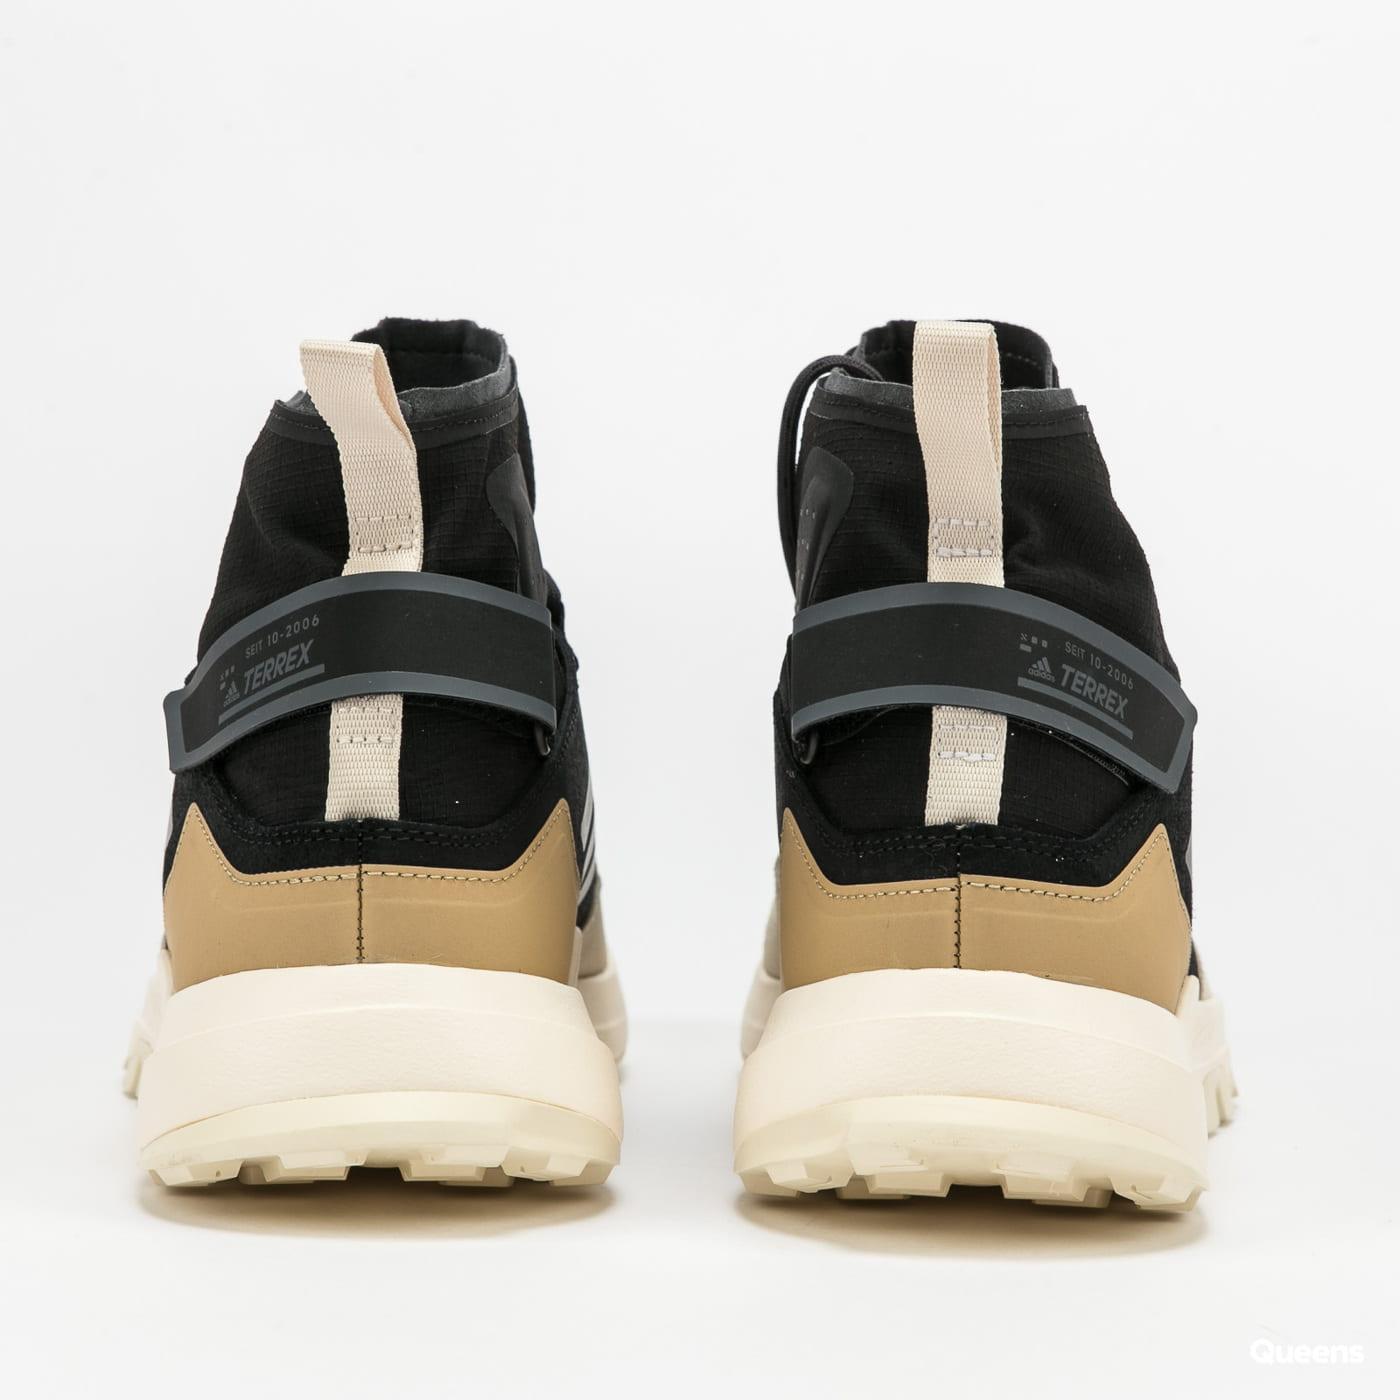 adidas Performance Terrex Hikster Mid Cblack / gresix / wonwhi